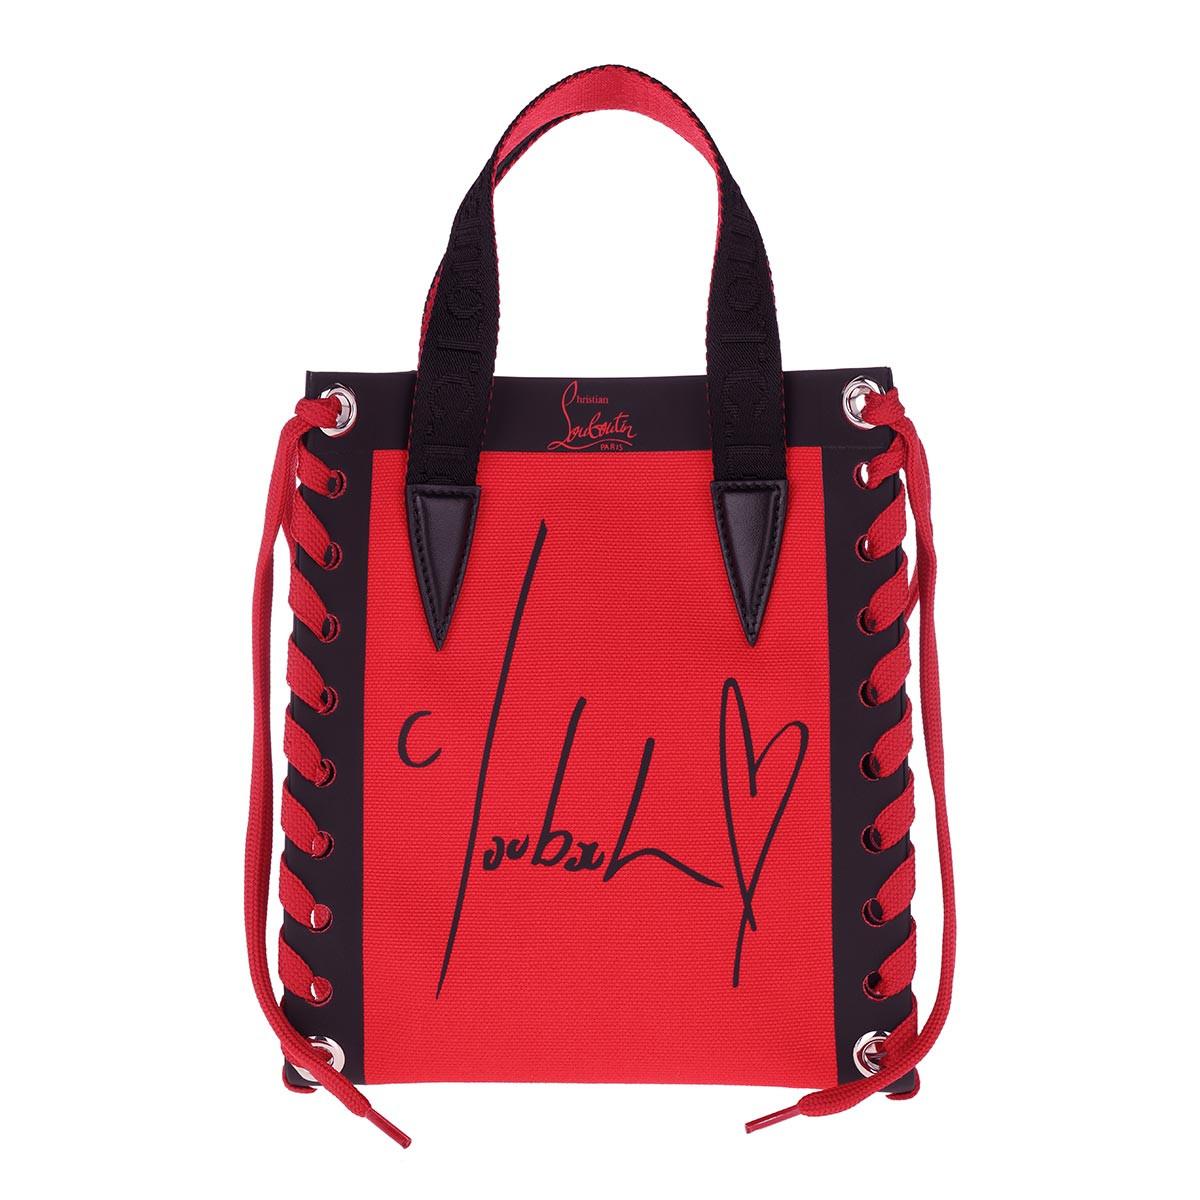 Christian Louboutin Tote - Cabalace Mini Tote Bag Canvas Loubi/Black - in rot - für Damen